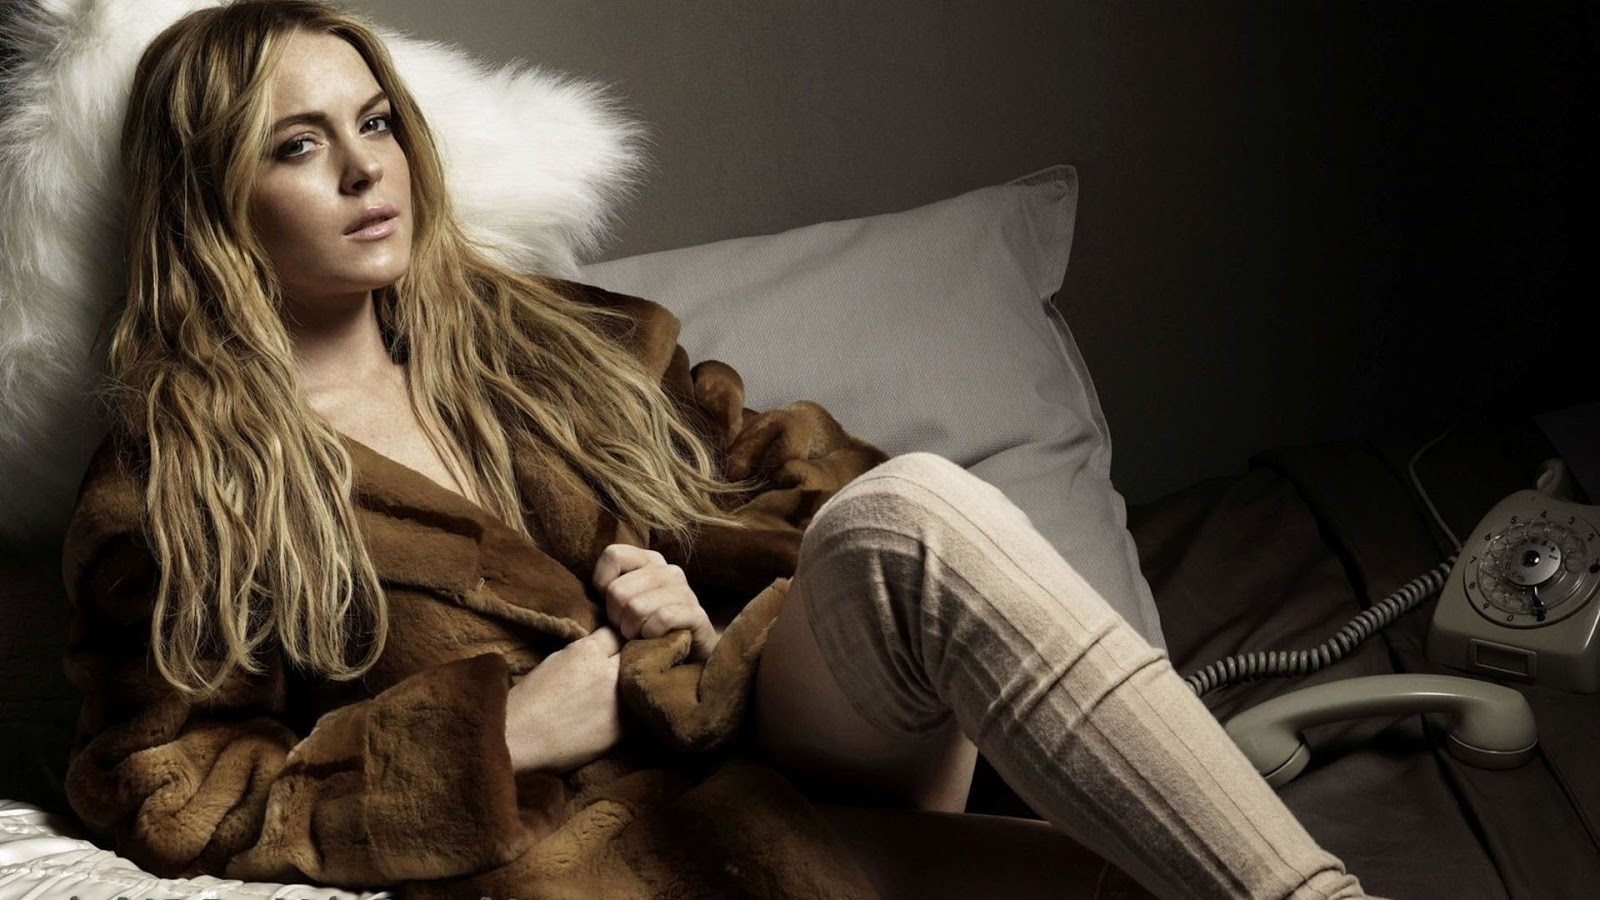 Like Every Body Naomi Watts hd New Nice Wallpapers 2013 1600x900